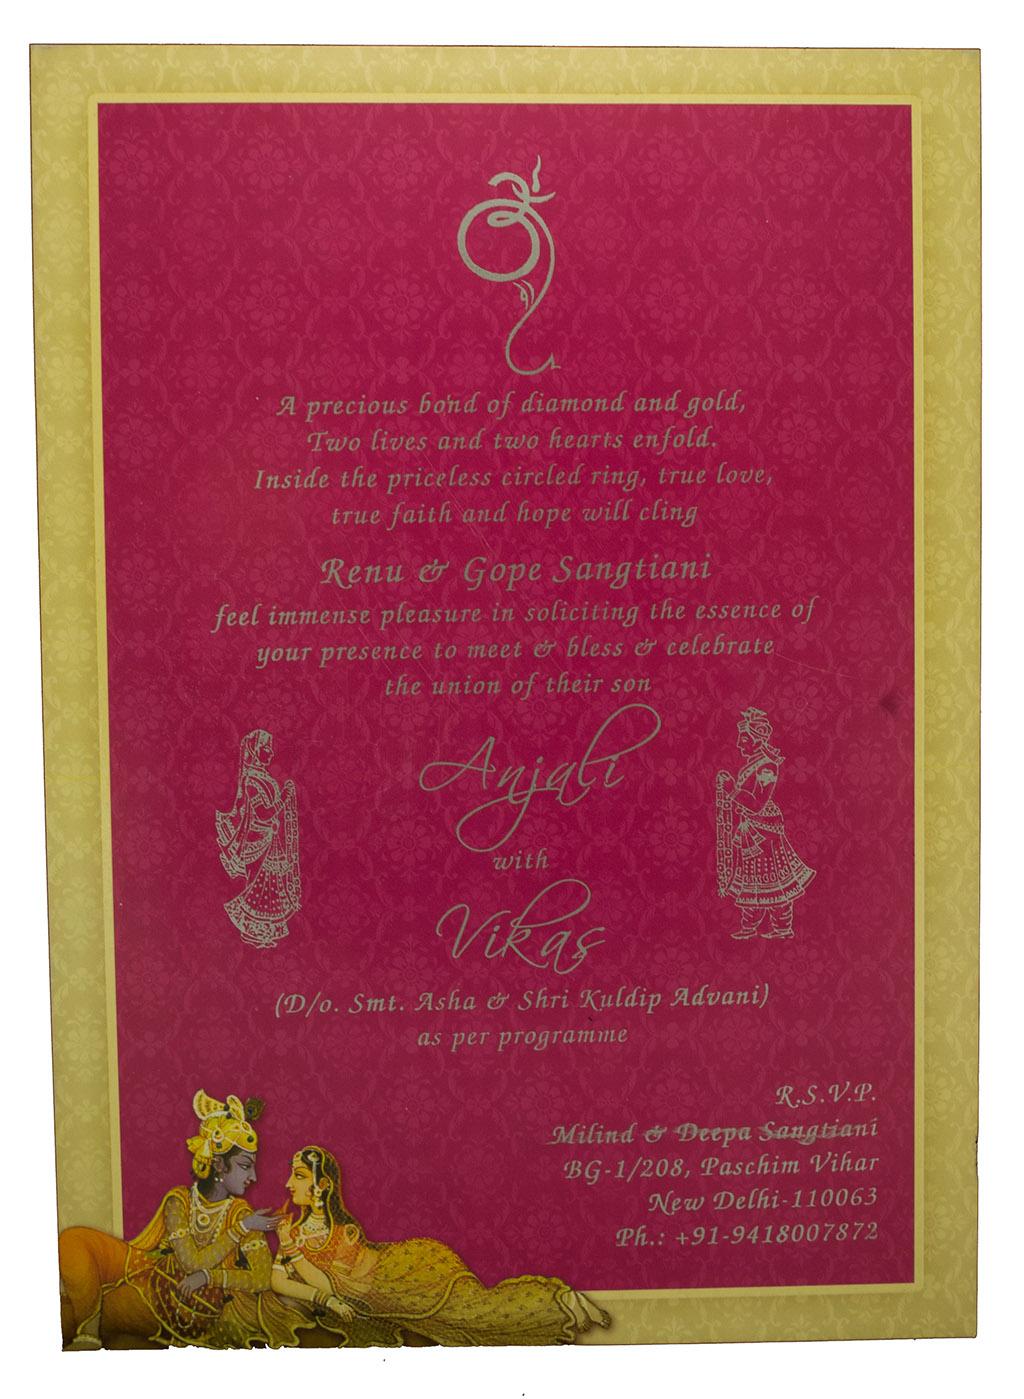 Radha Krishna themed wedding invite with narrative images